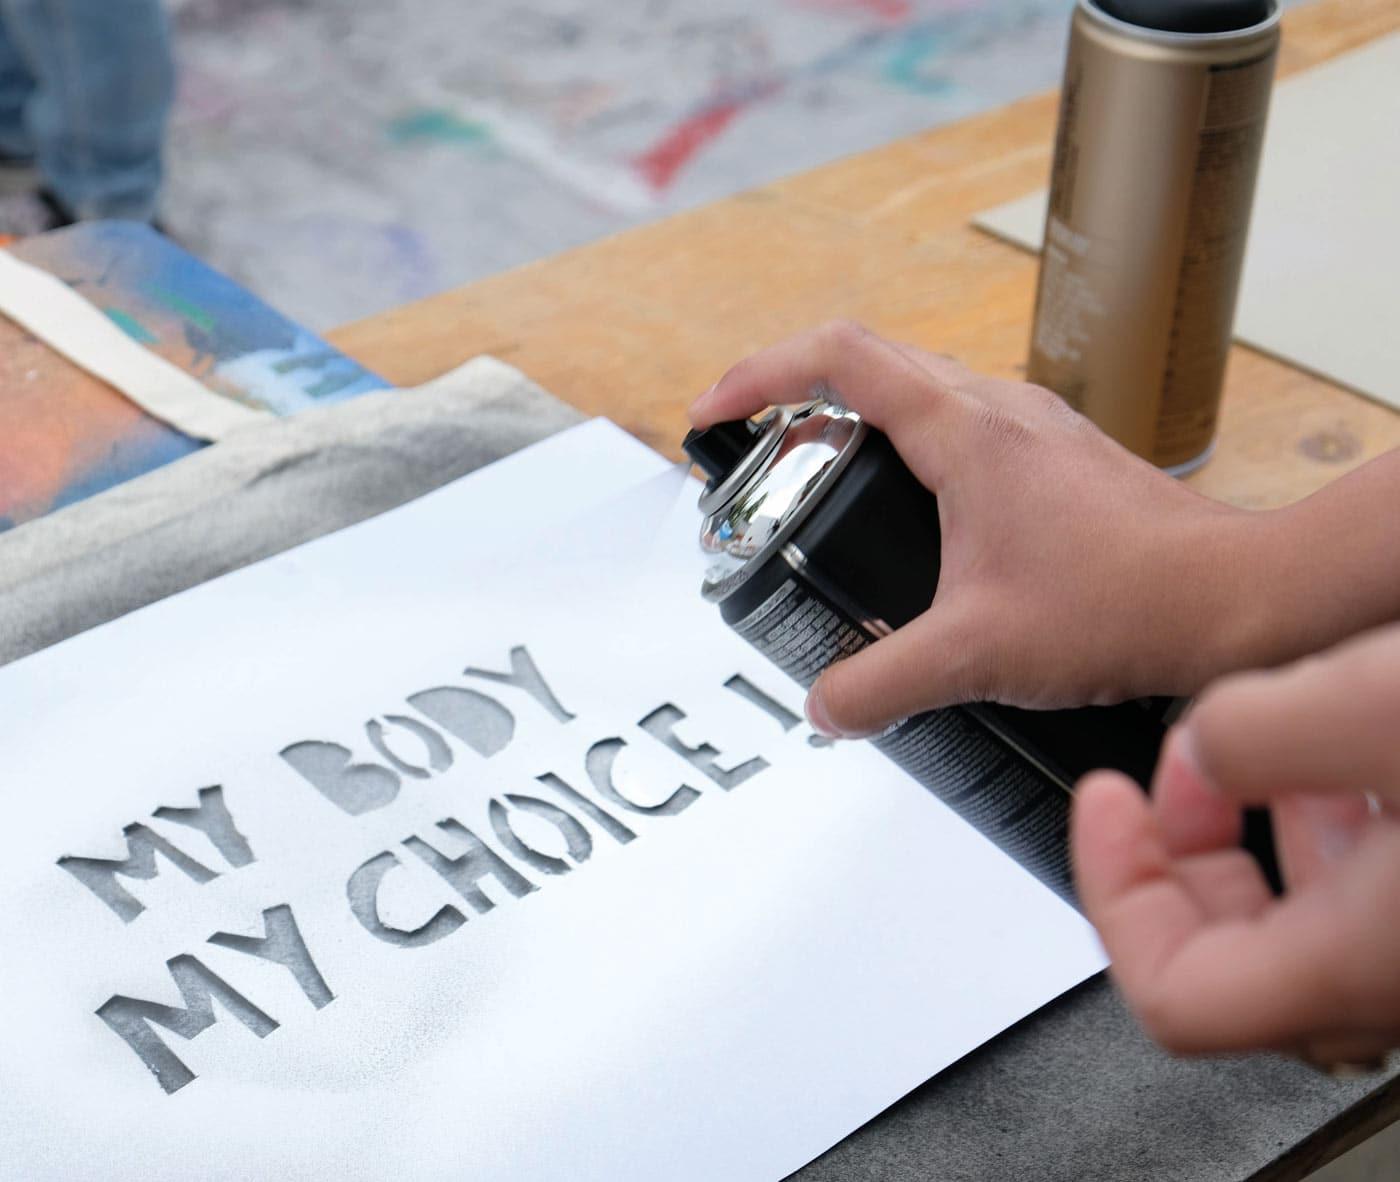 Road to Utopia: My Body my Choice // HIMBEER